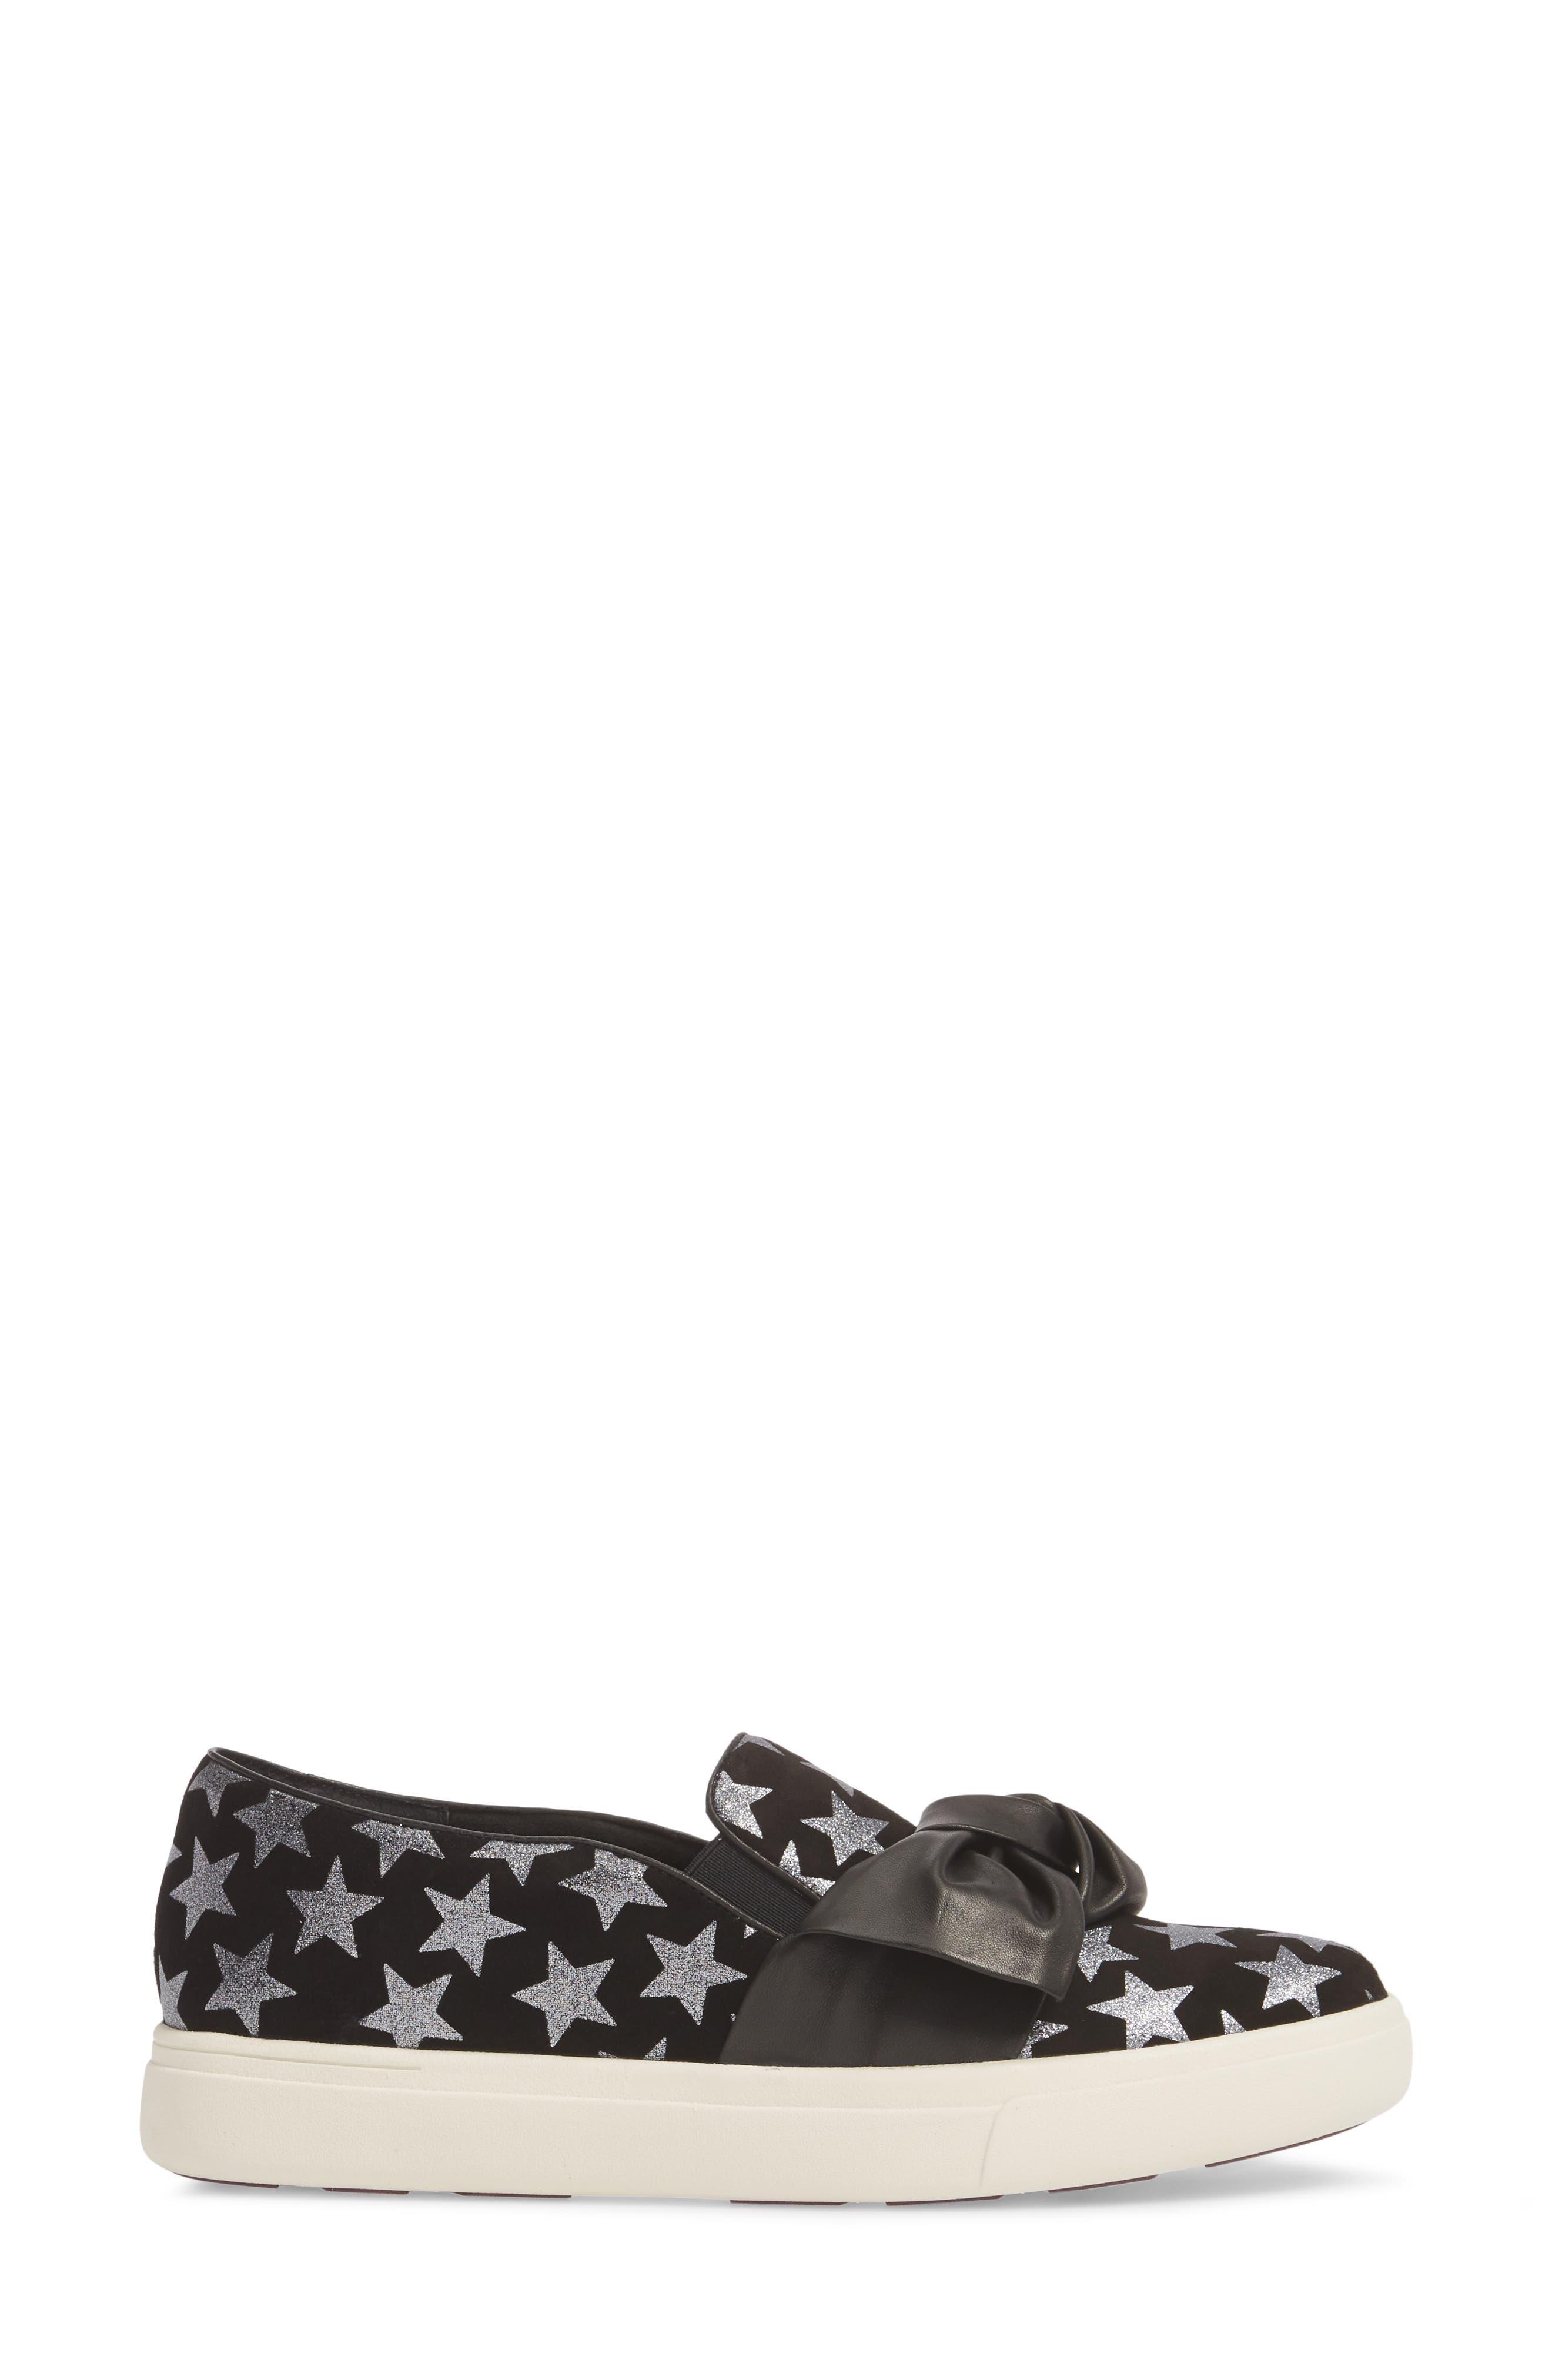 Odelet Slip-On Sneaker,                             Alternate thumbnail 3, color,                             BLACK/ PEWTER SUEDE